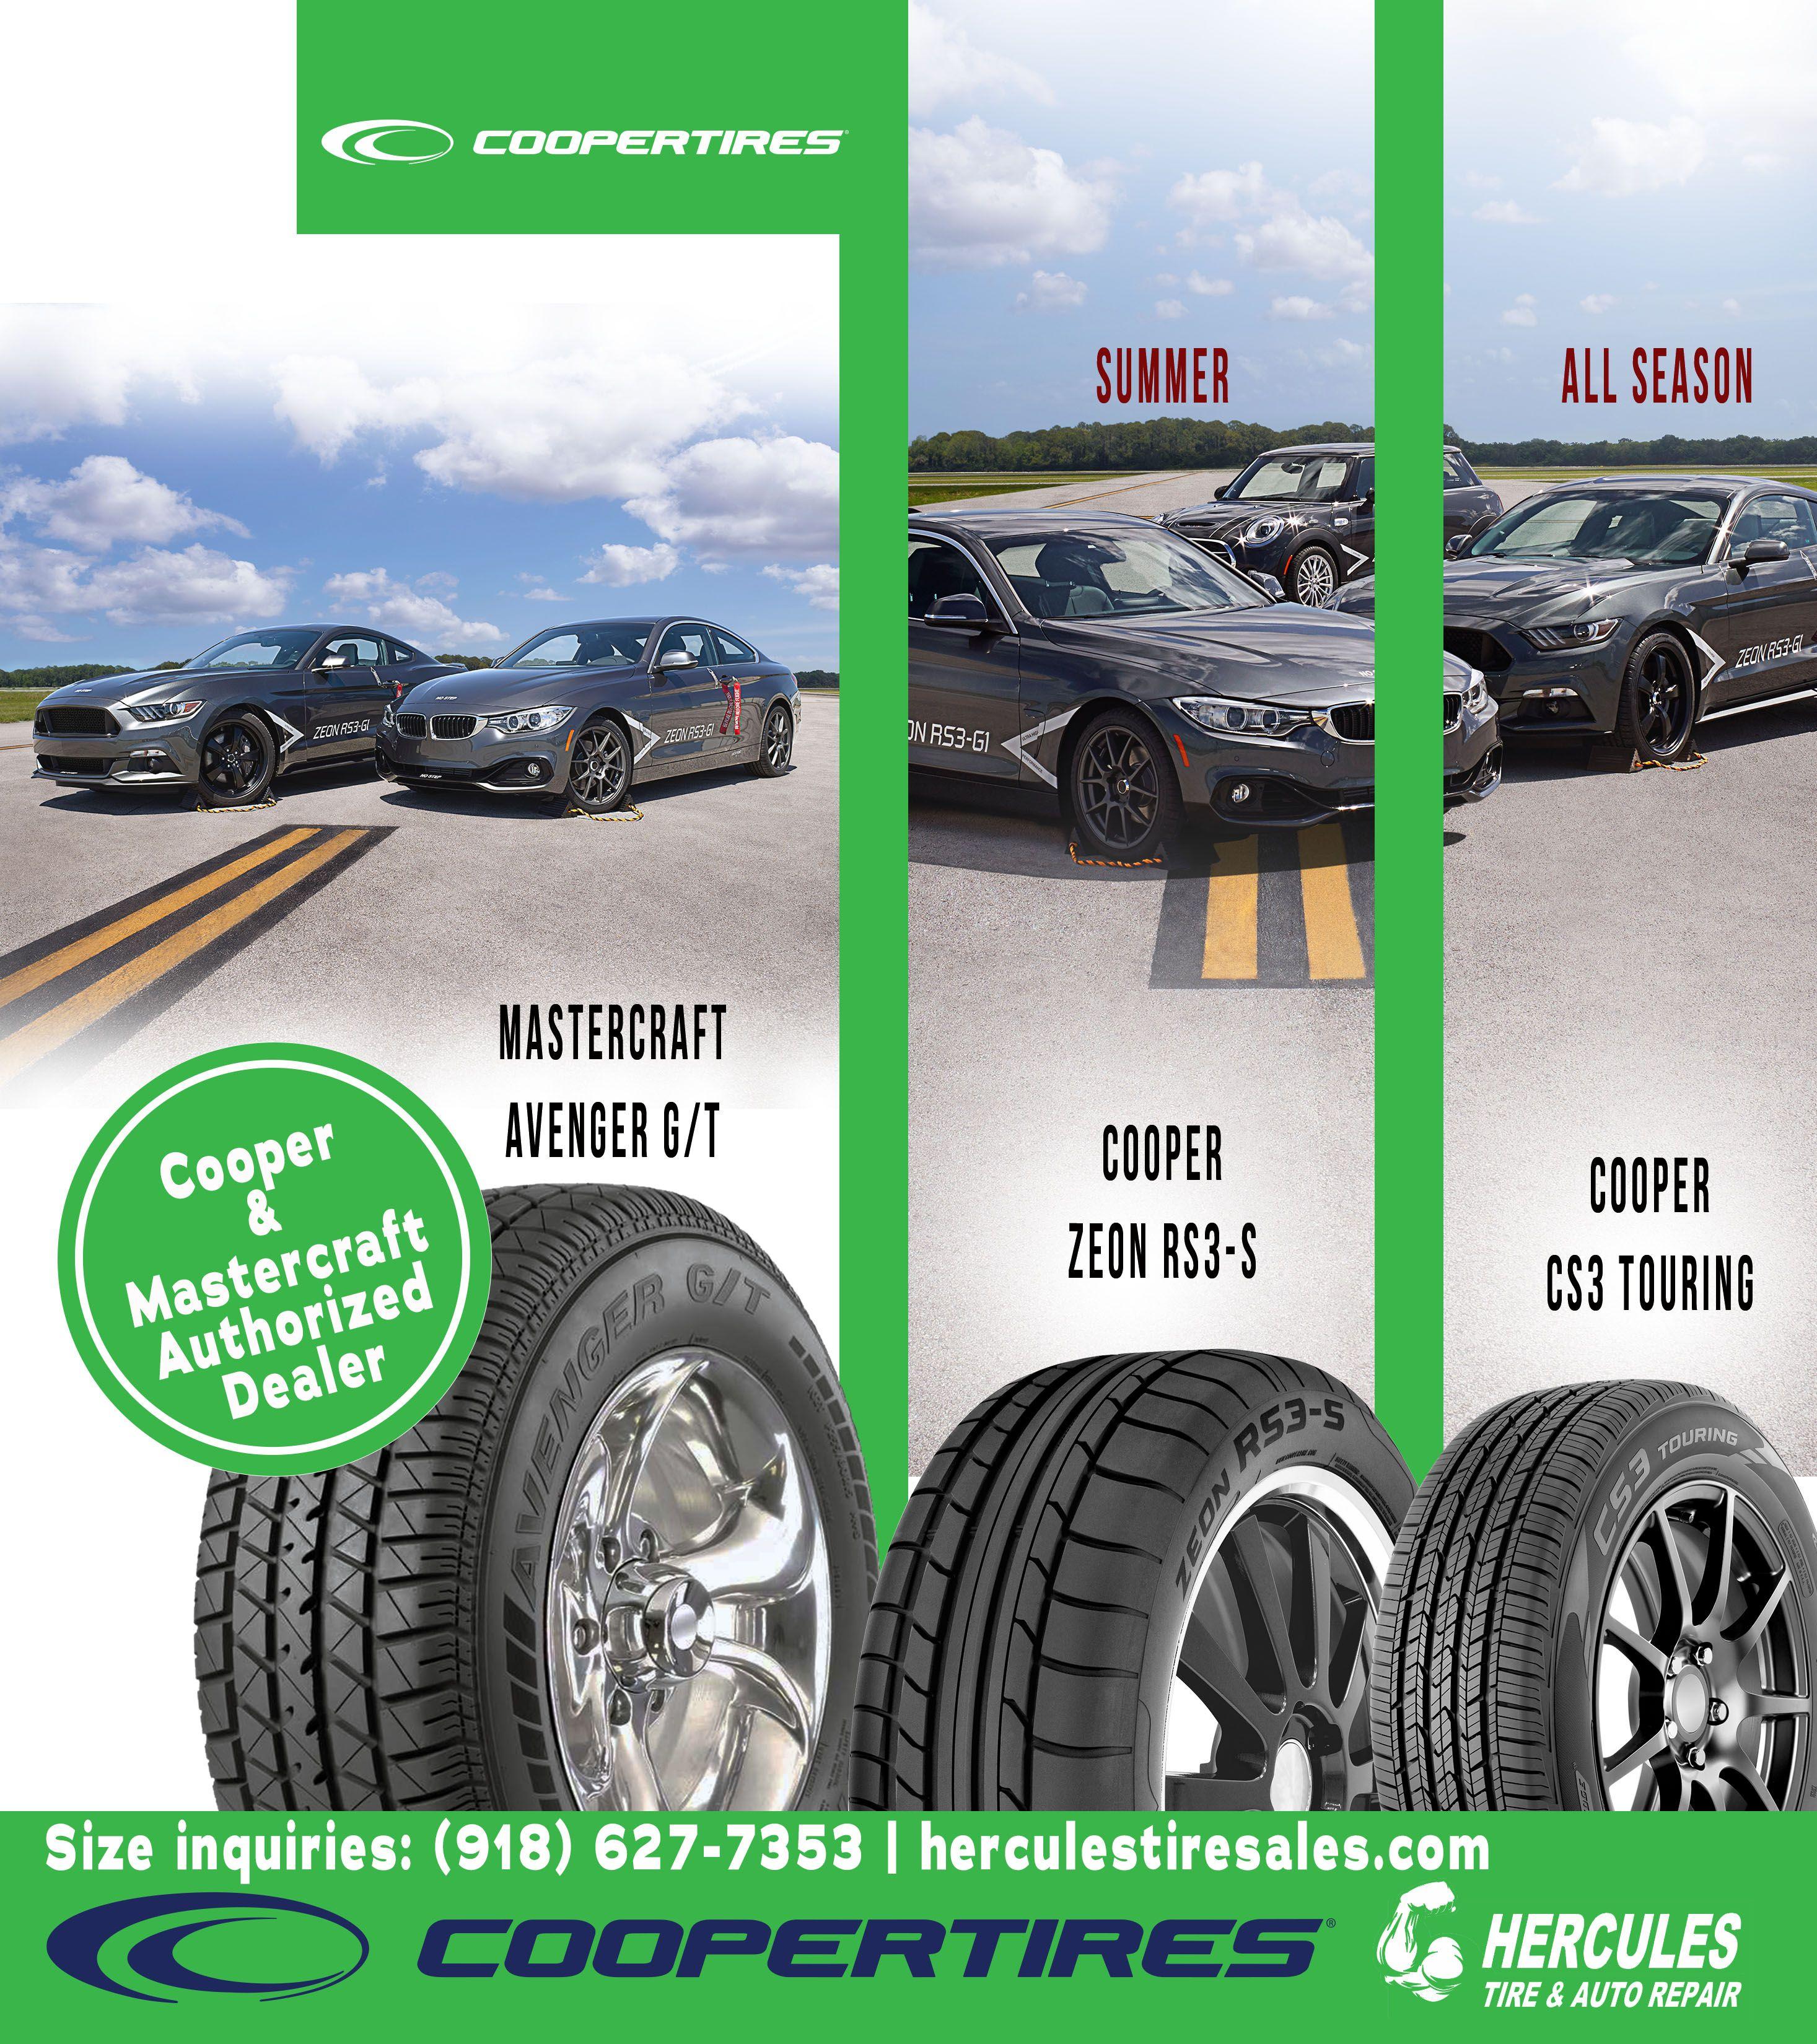 Pin by Hercules Tire & Auto Repair on Tire & Auto Repair